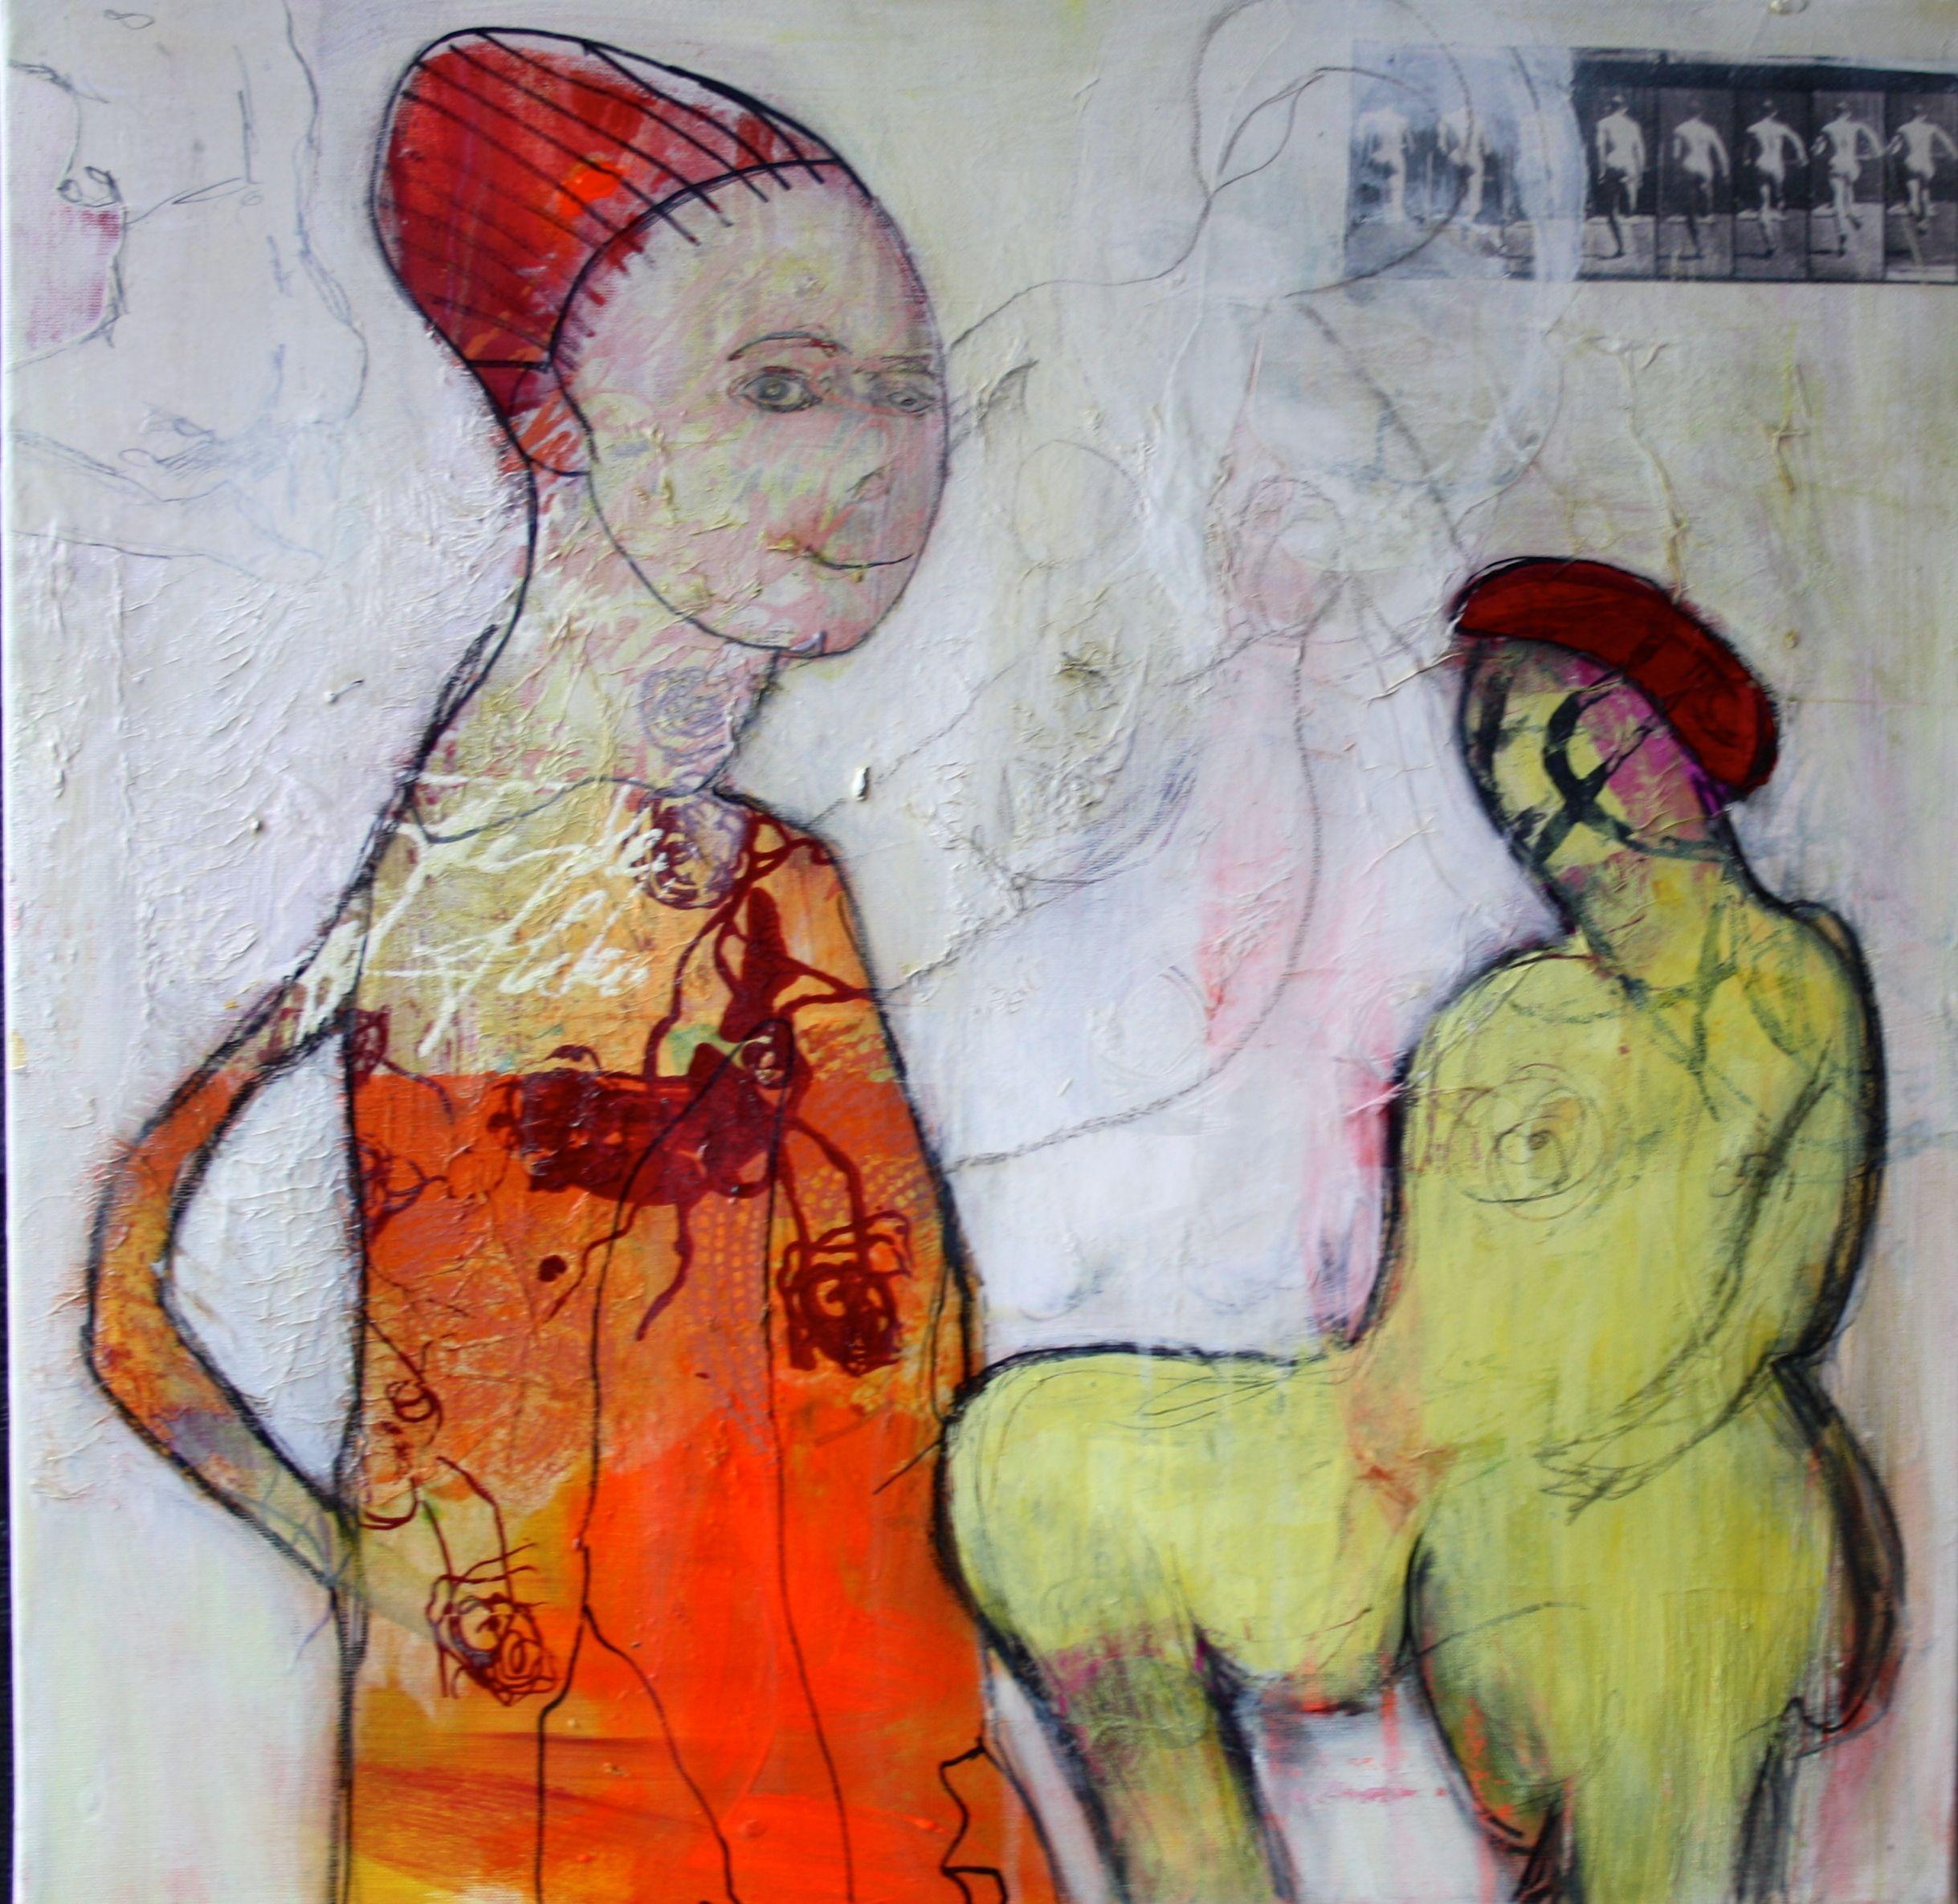 Mennesker Akryl Oilpastel Collage Papir Serigrafitryk Kul Blyant Tegning Maleri Galleri Www Rieskunstgalleri Dk Artist Art Painting